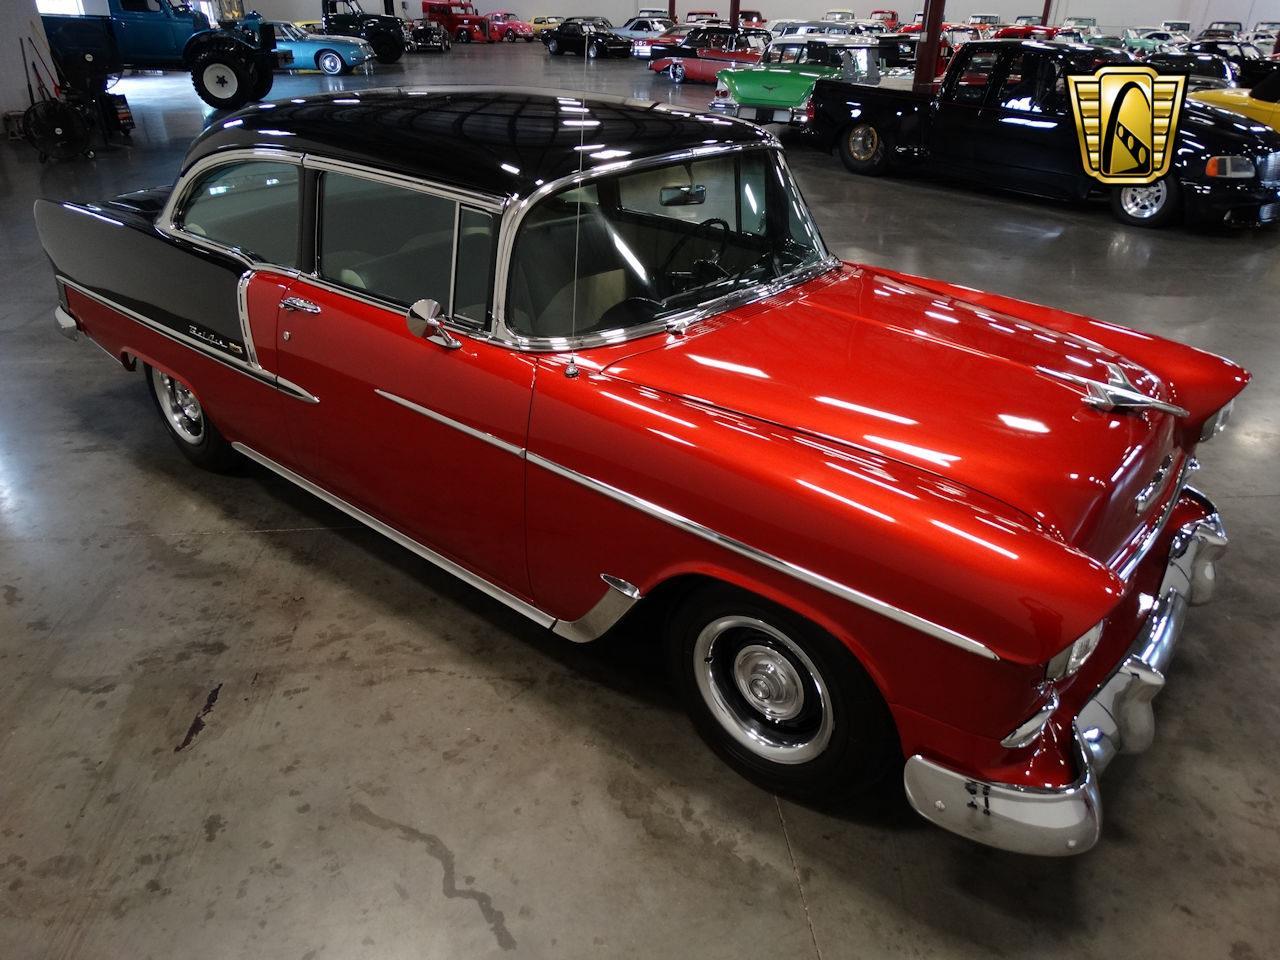 1955 Chevrolet Bel Air (CC-1342211) for sale in O'Fallon, Illinois